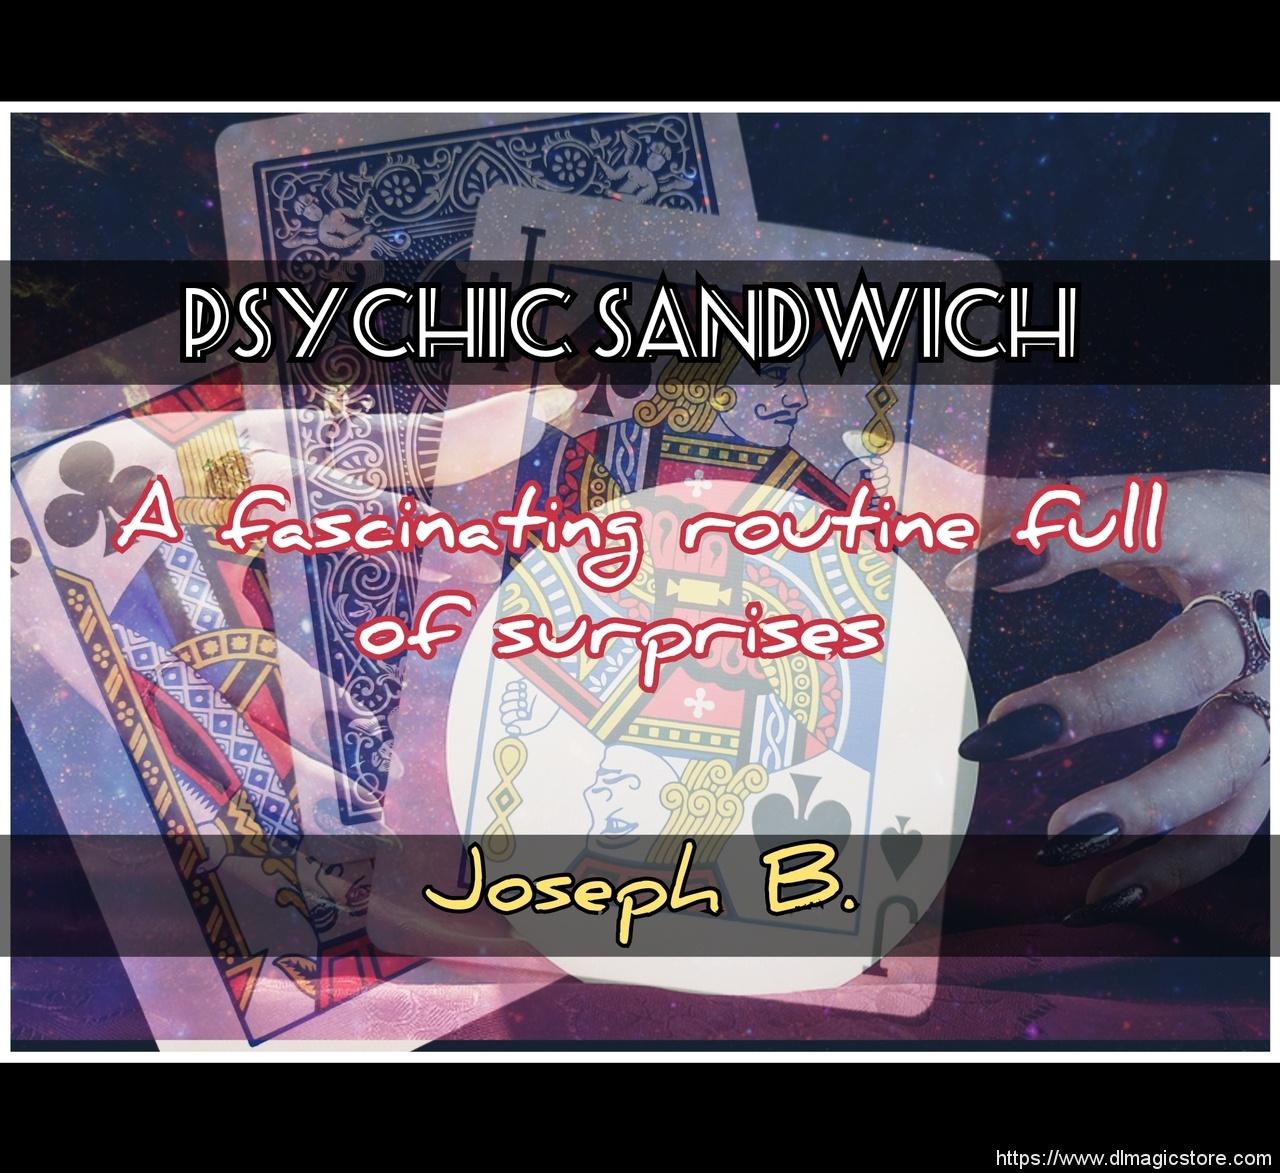 Psychic Sandwich by Joseph B